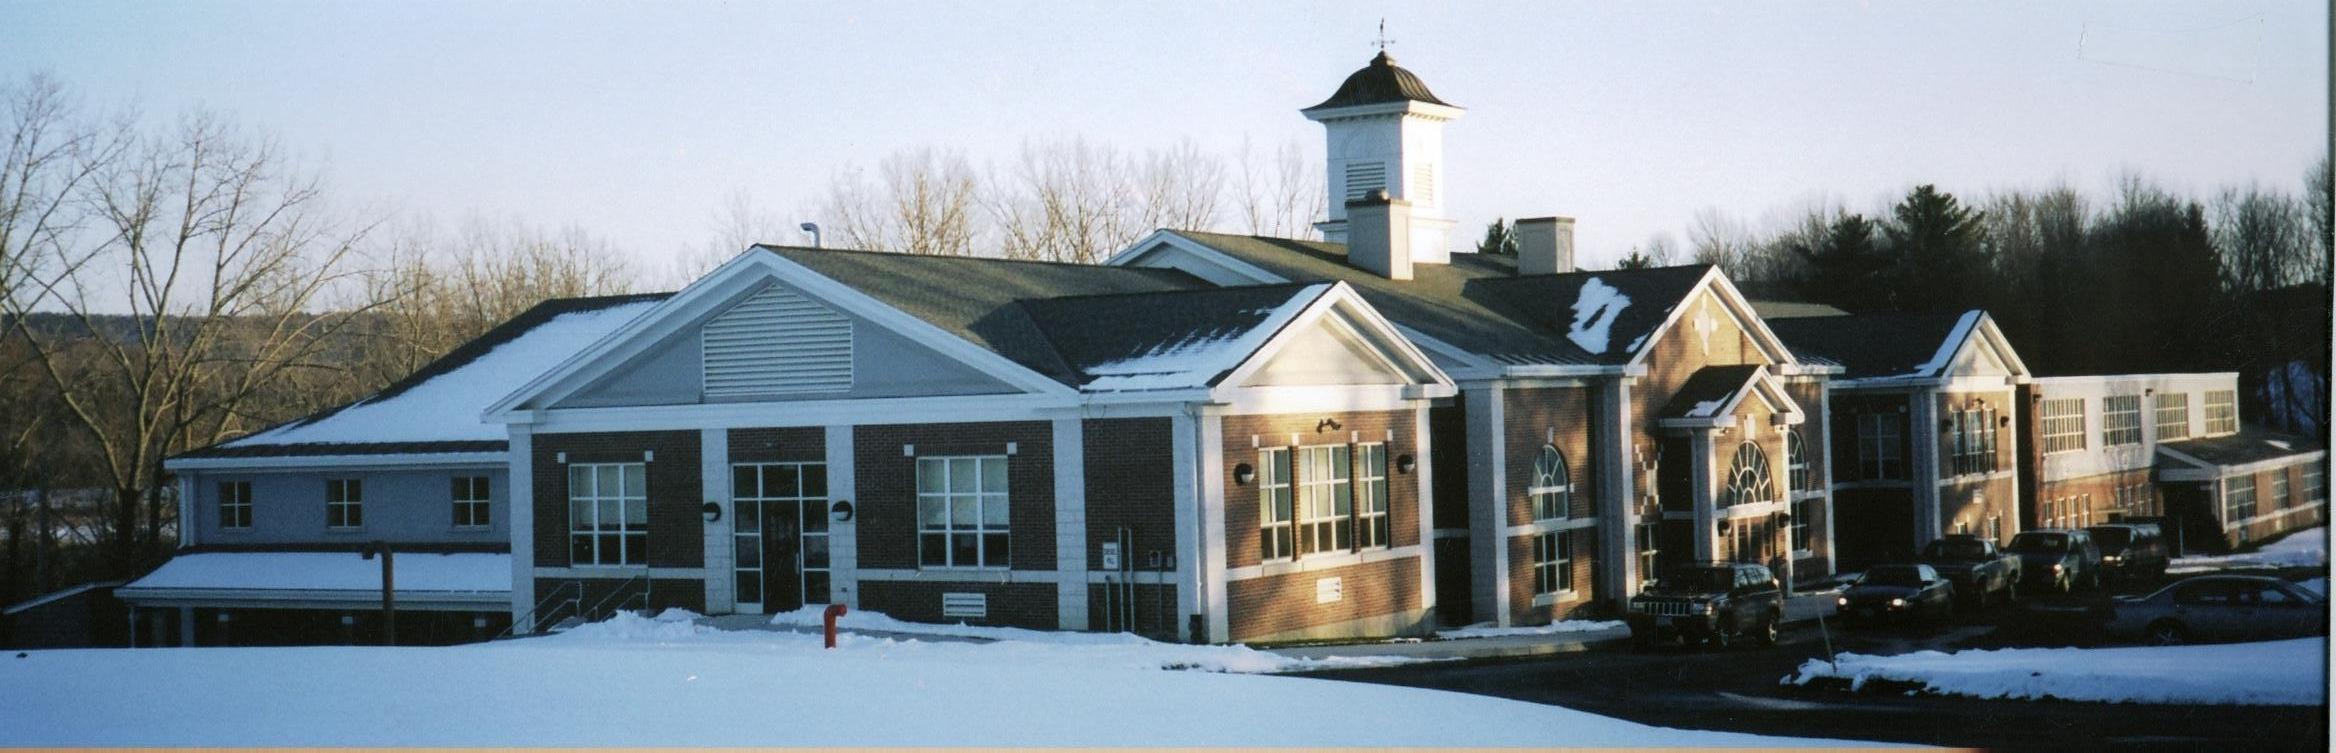 The Richmond School, Richmond, Massachusetts